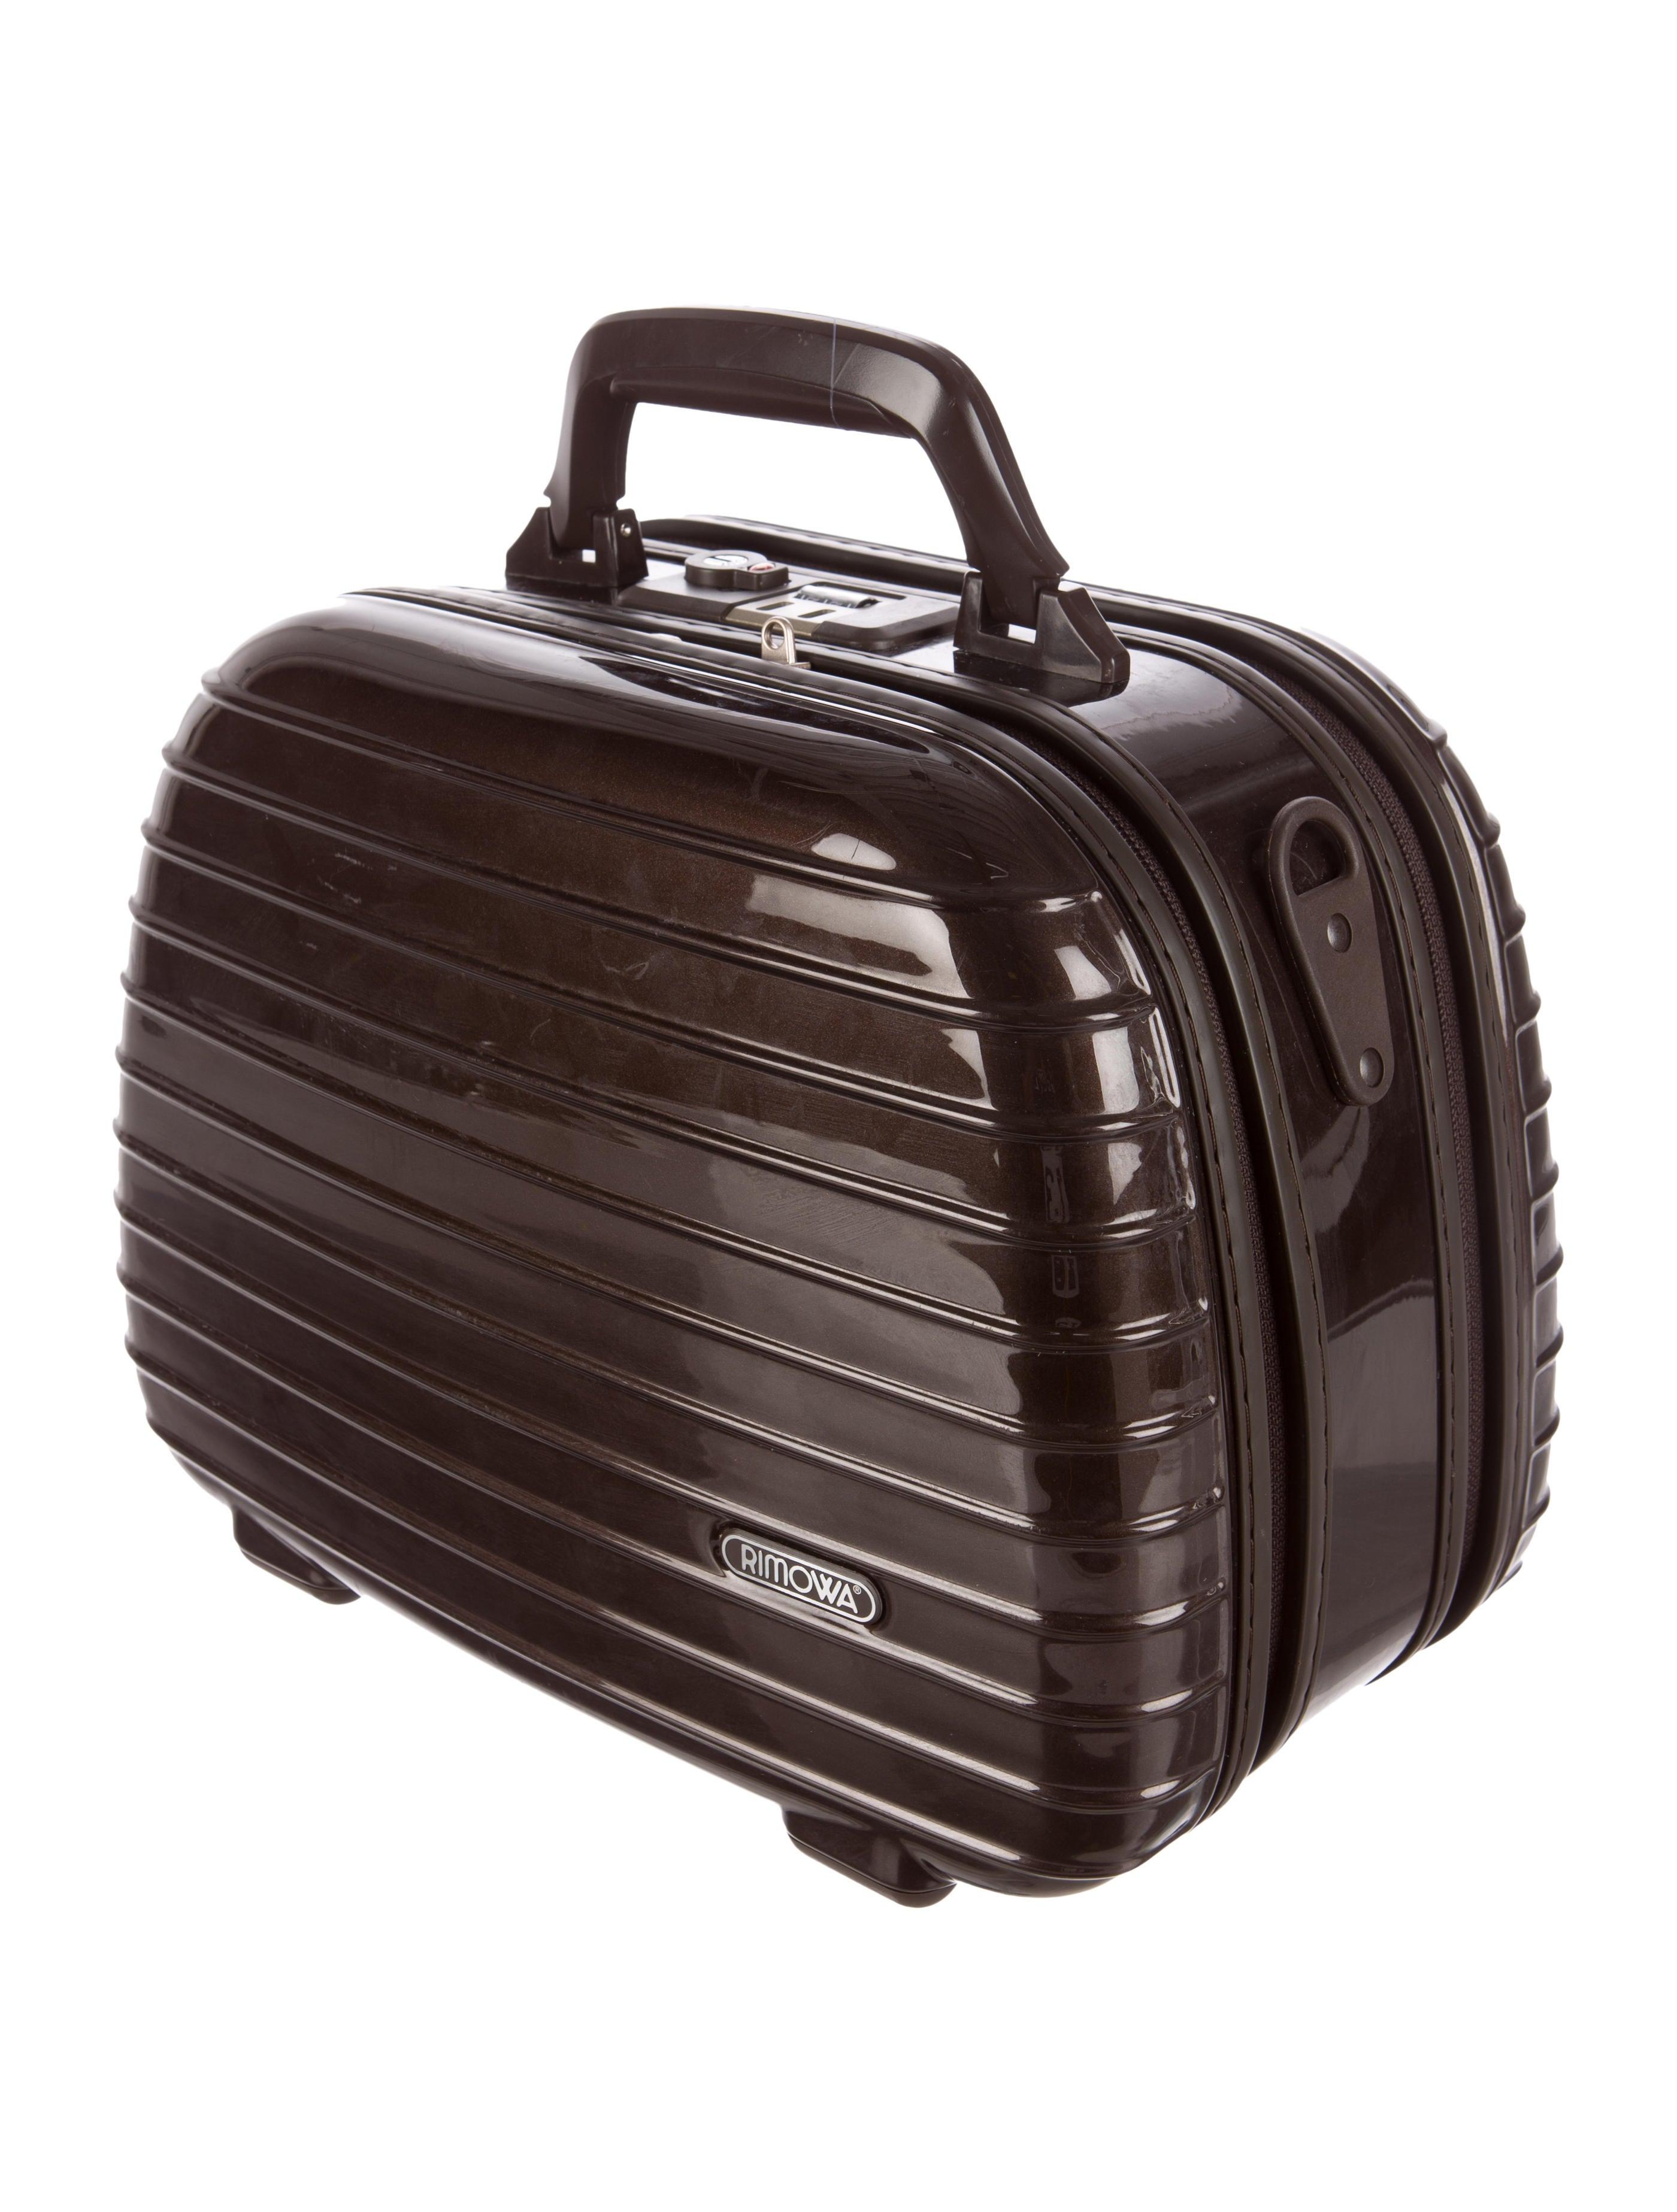 rimowa luggage salsa deluxe beauty case handbags. Black Bedroom Furniture Sets. Home Design Ideas